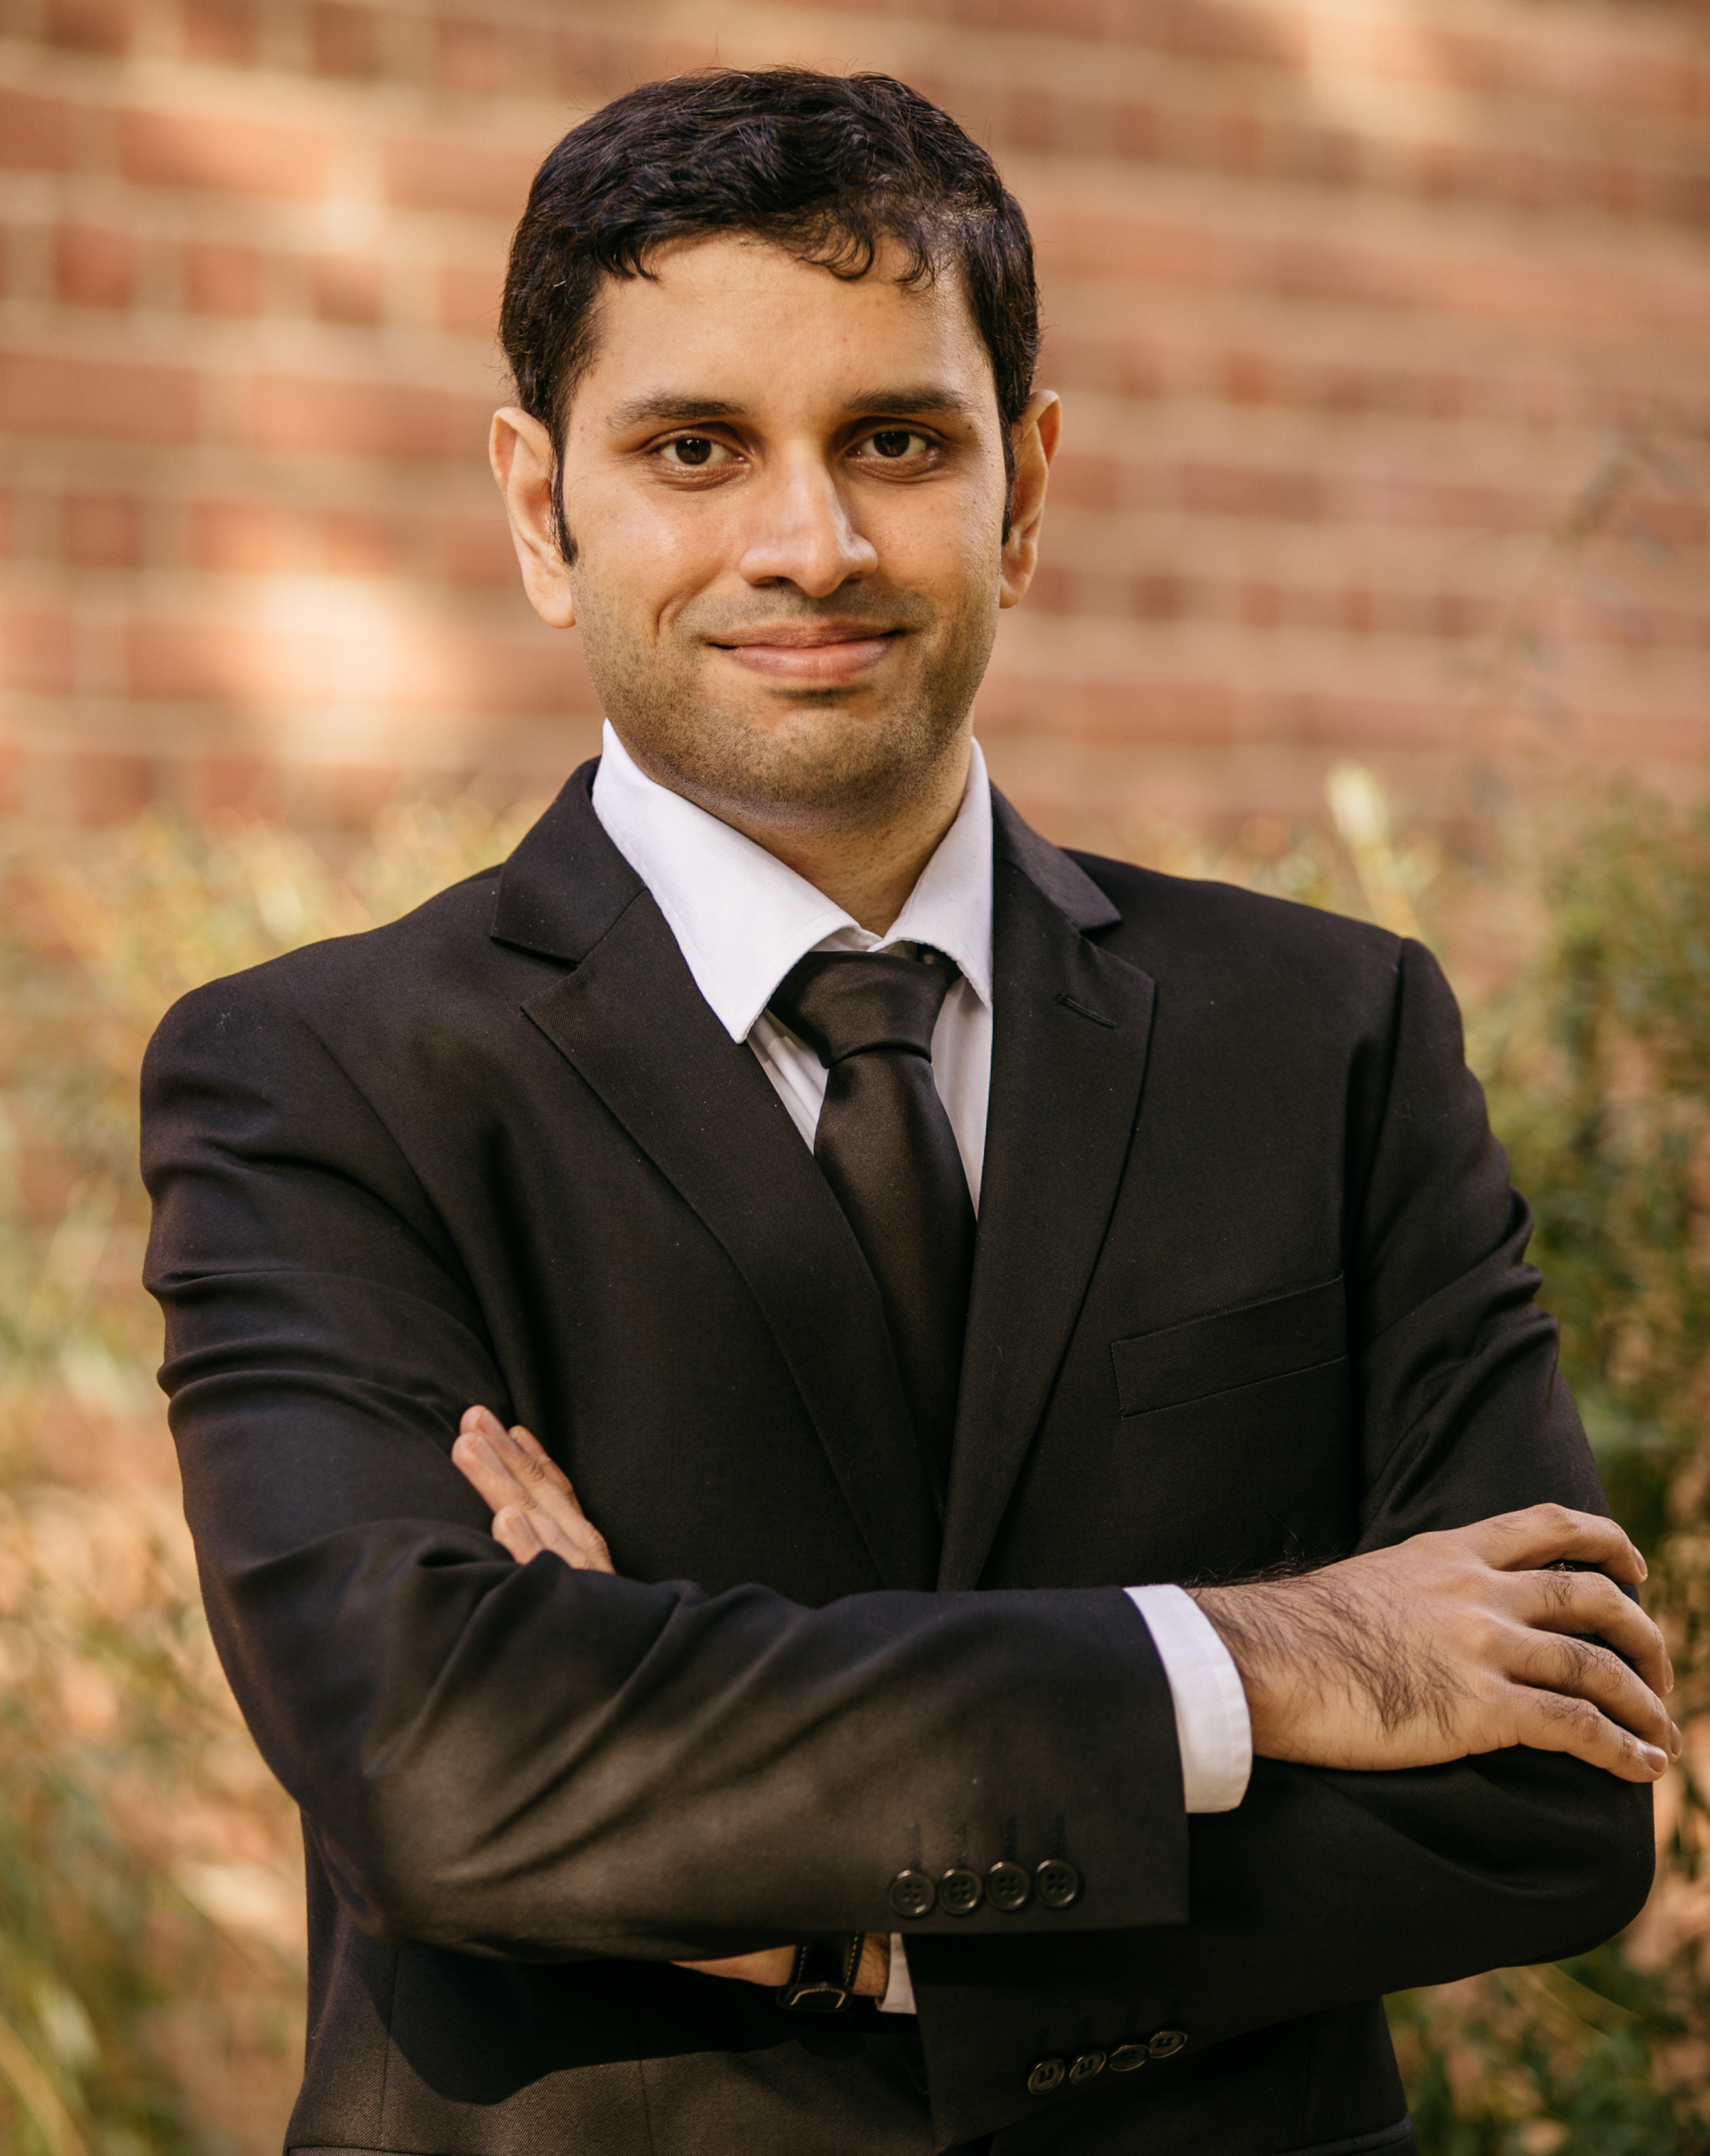 Hammad Shaikh